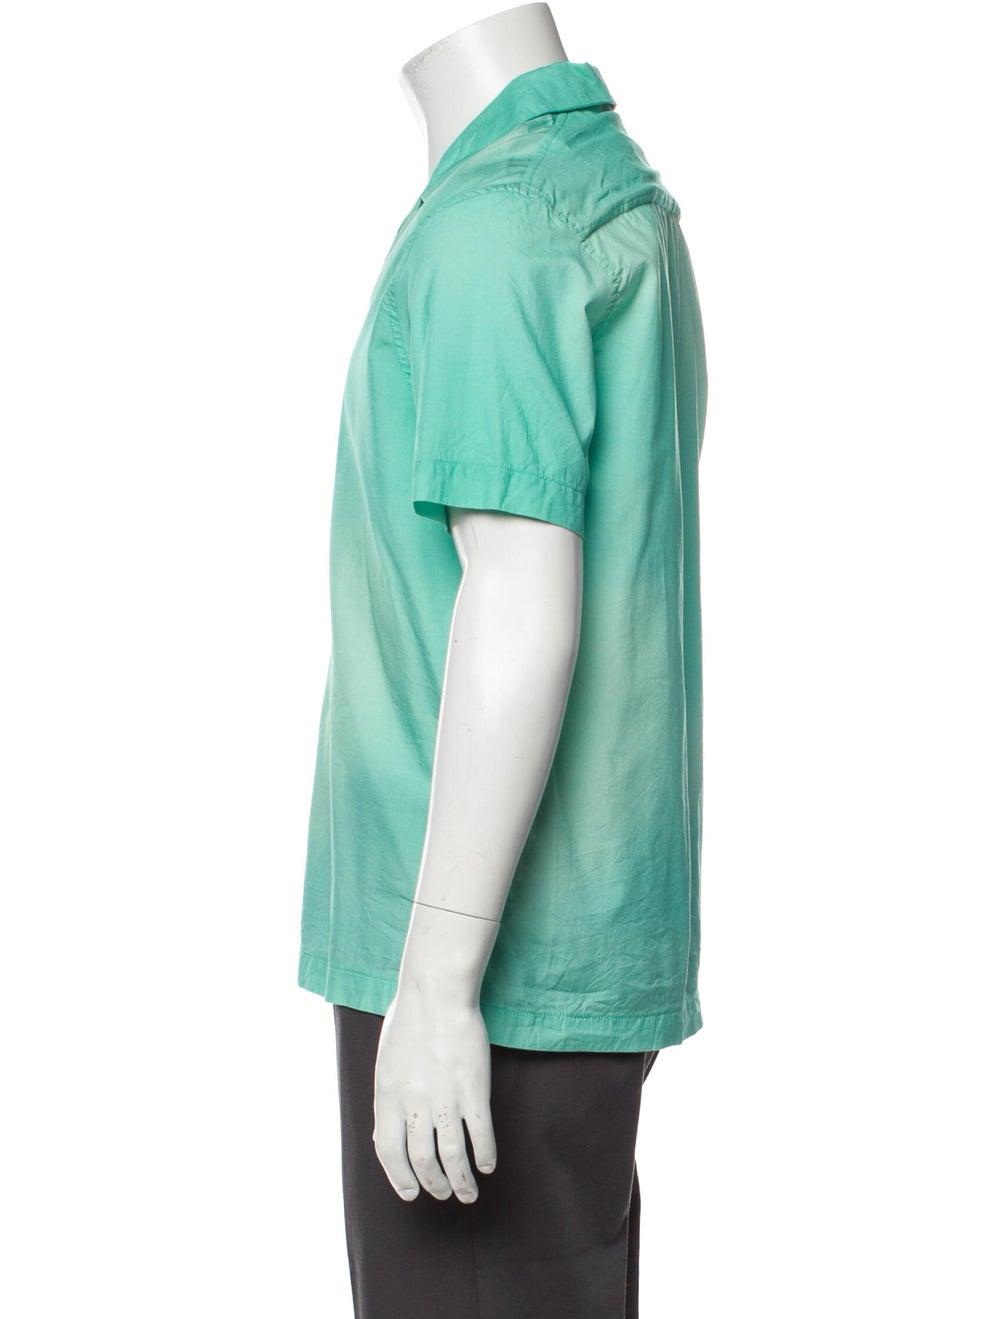 Goodfight Silk Short Sleeve Shirt Green - image 2